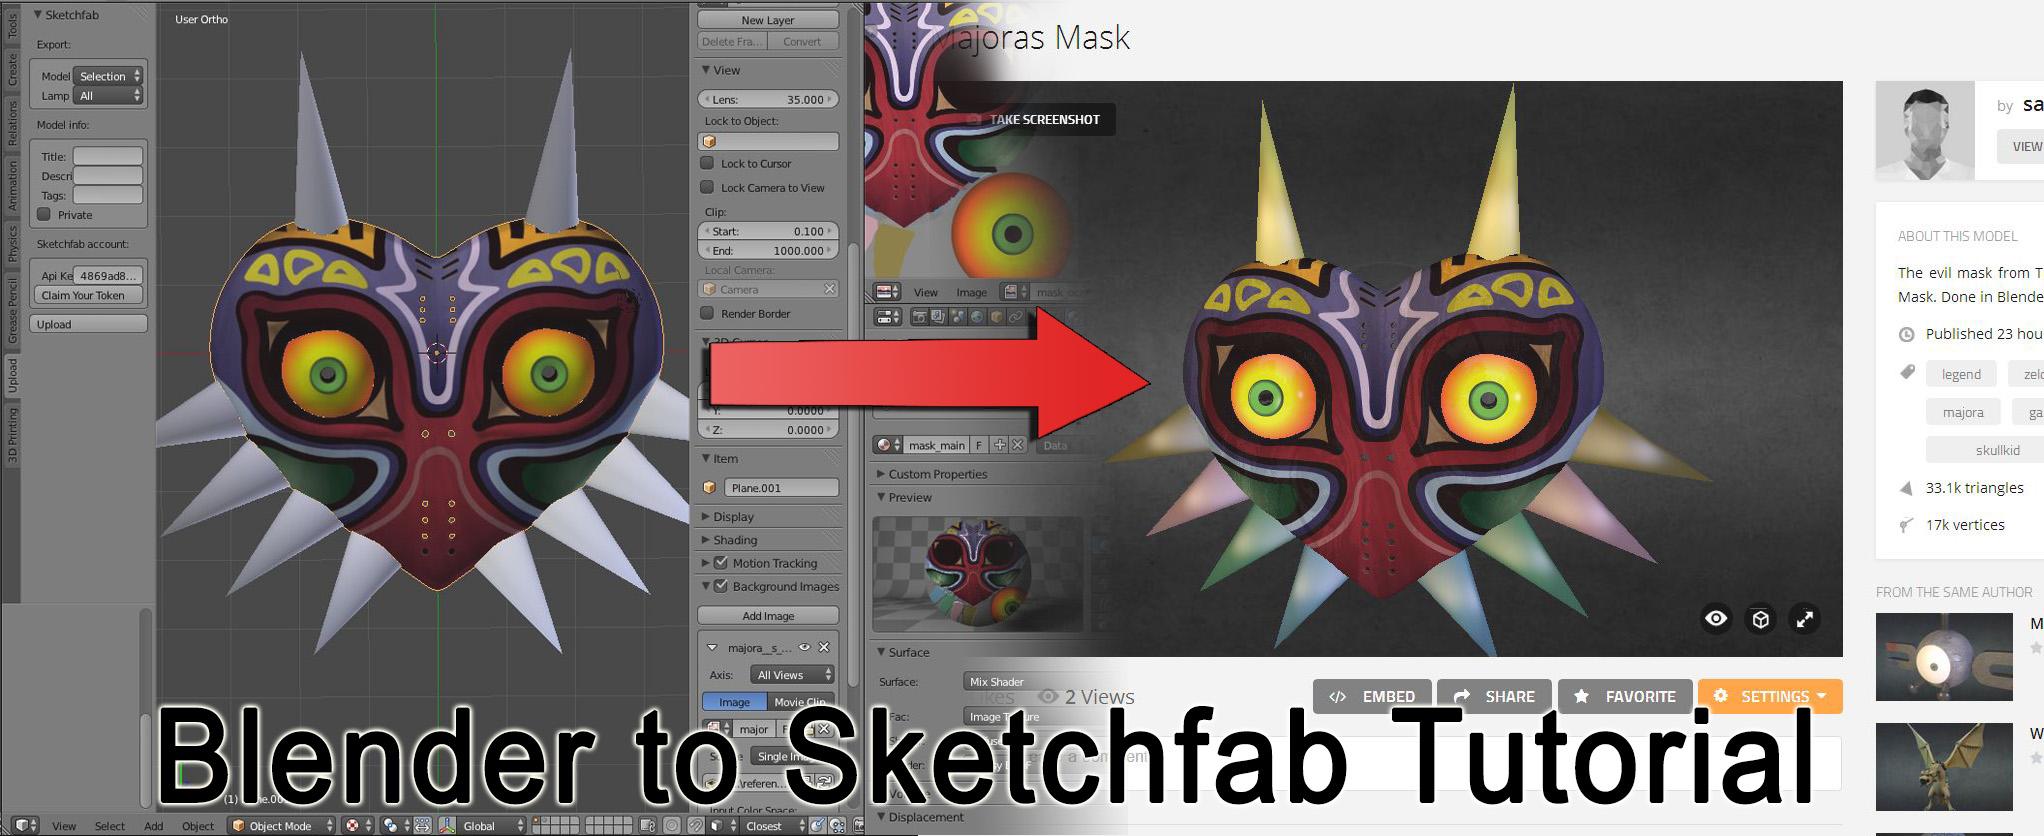 Blender to Sketchfab Tutorial – SaphireStudio